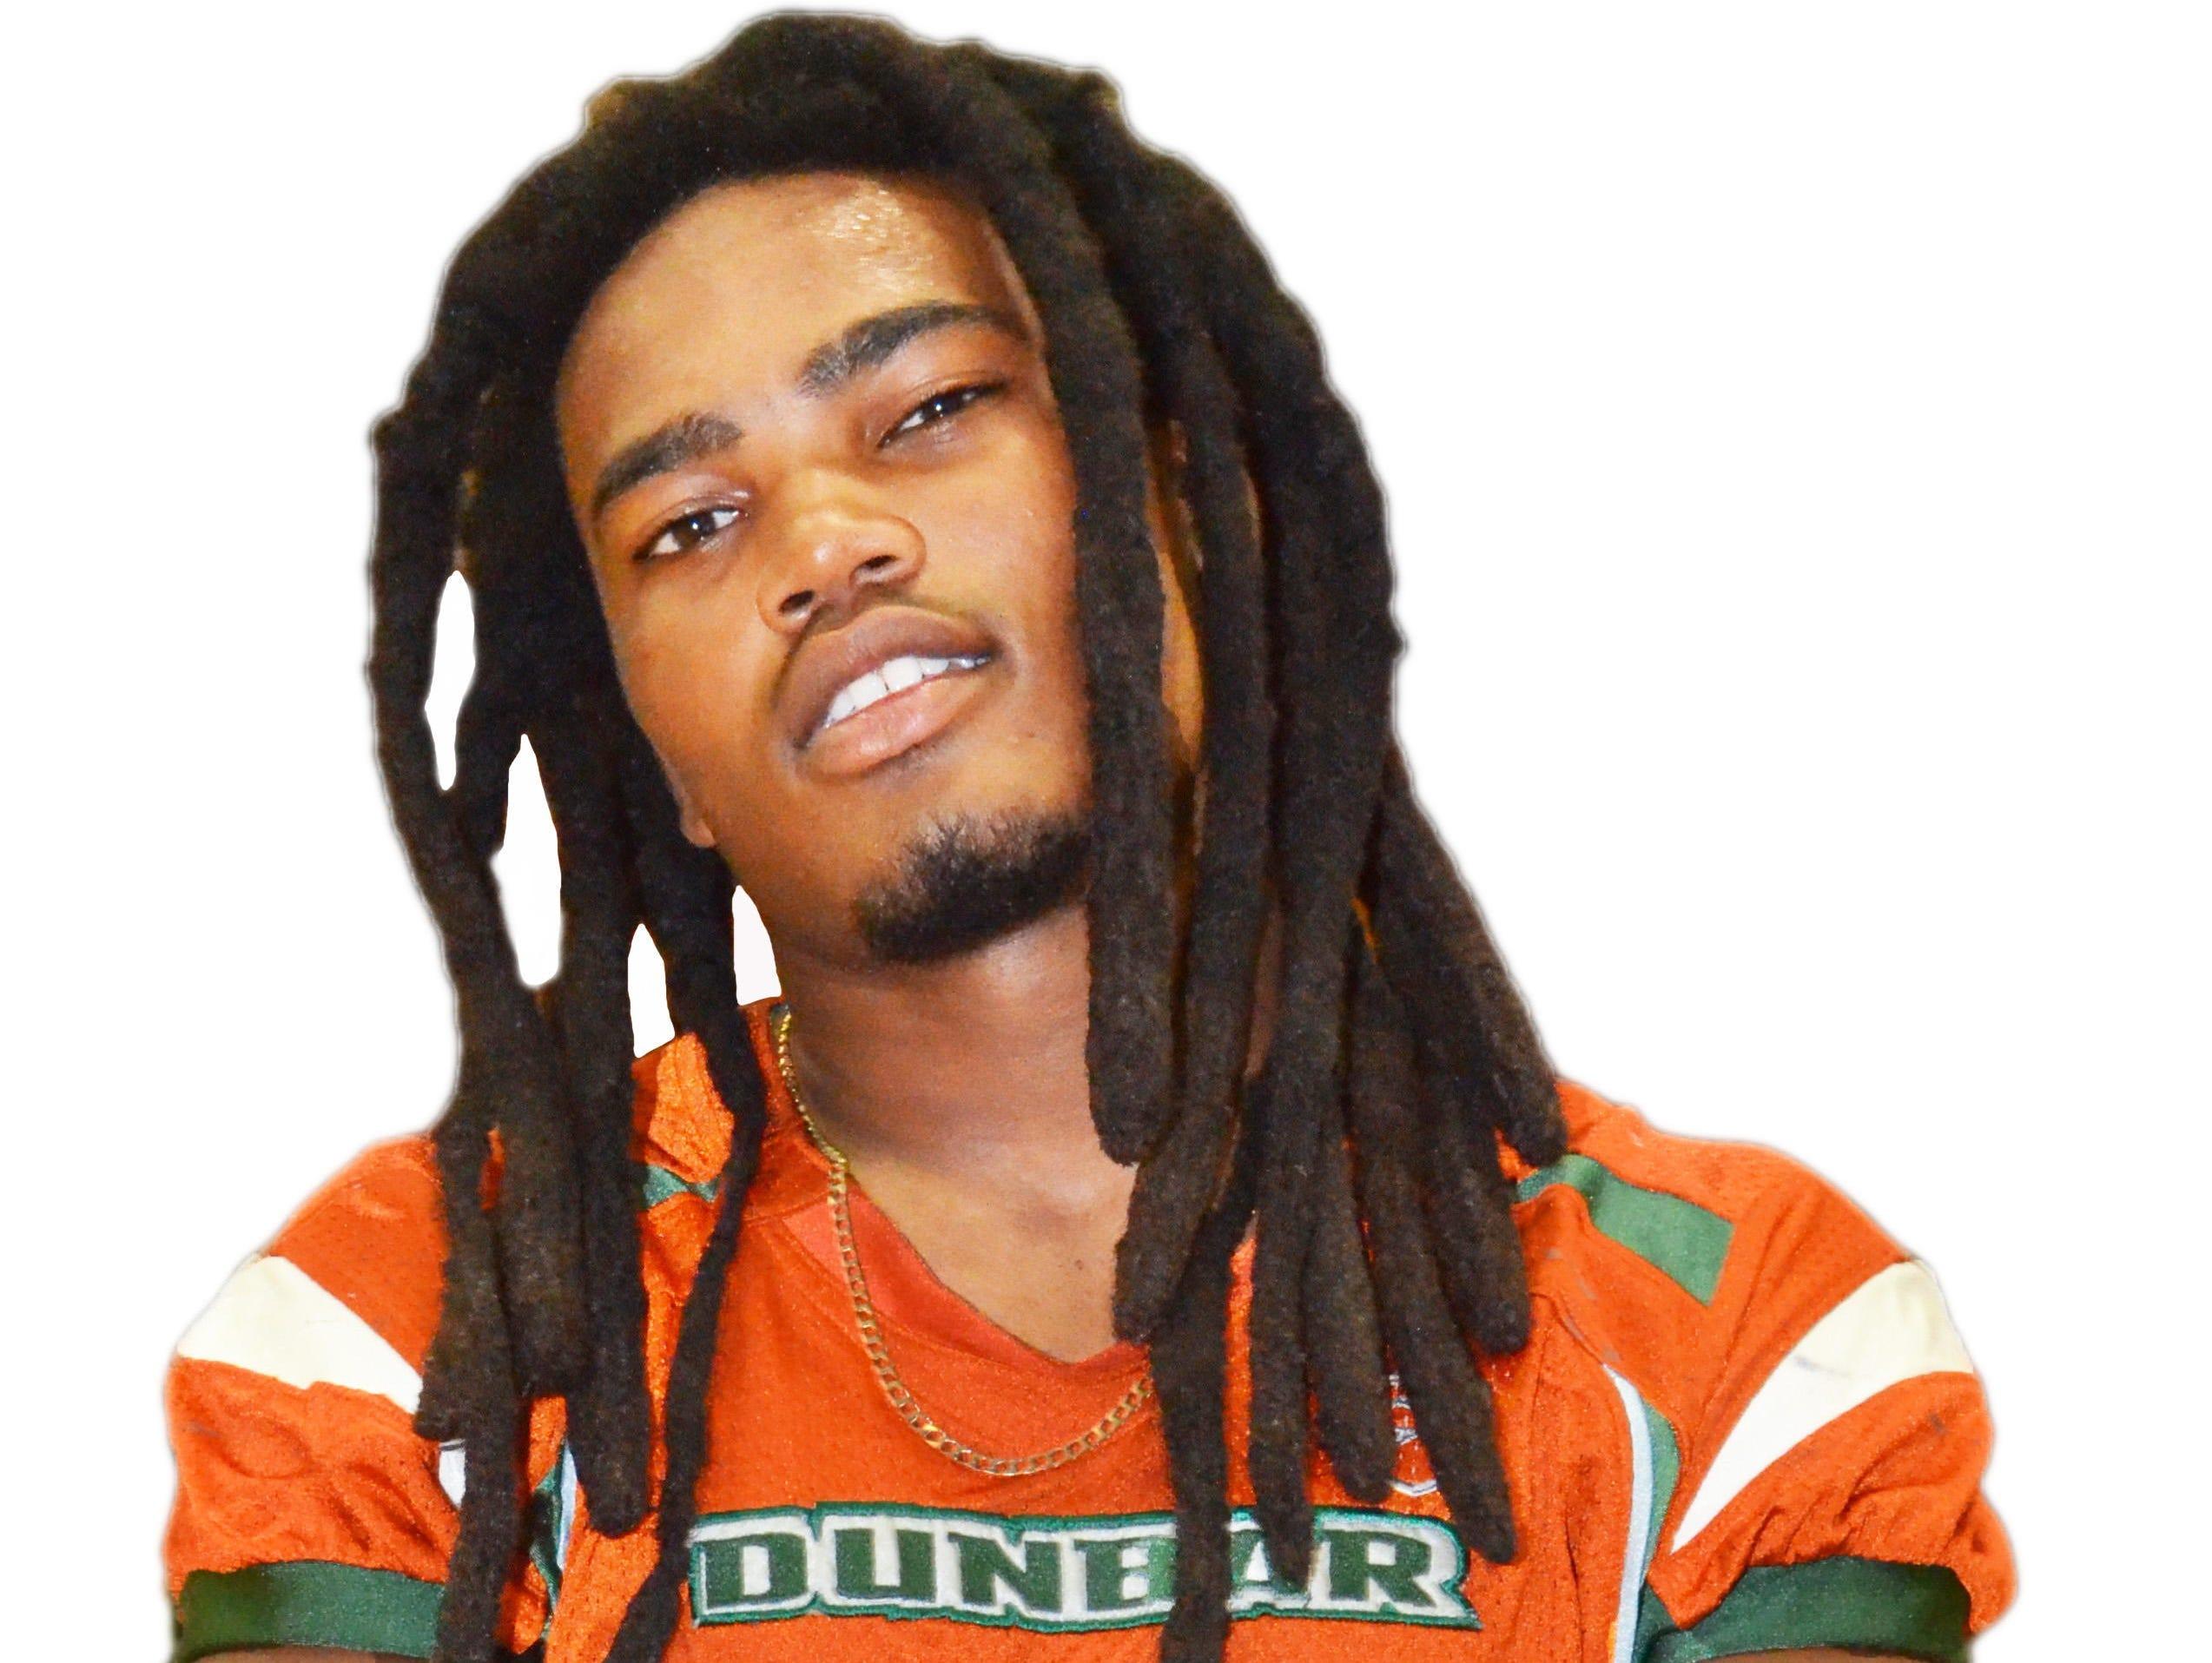 Jailyn Mays, Dunbar senior